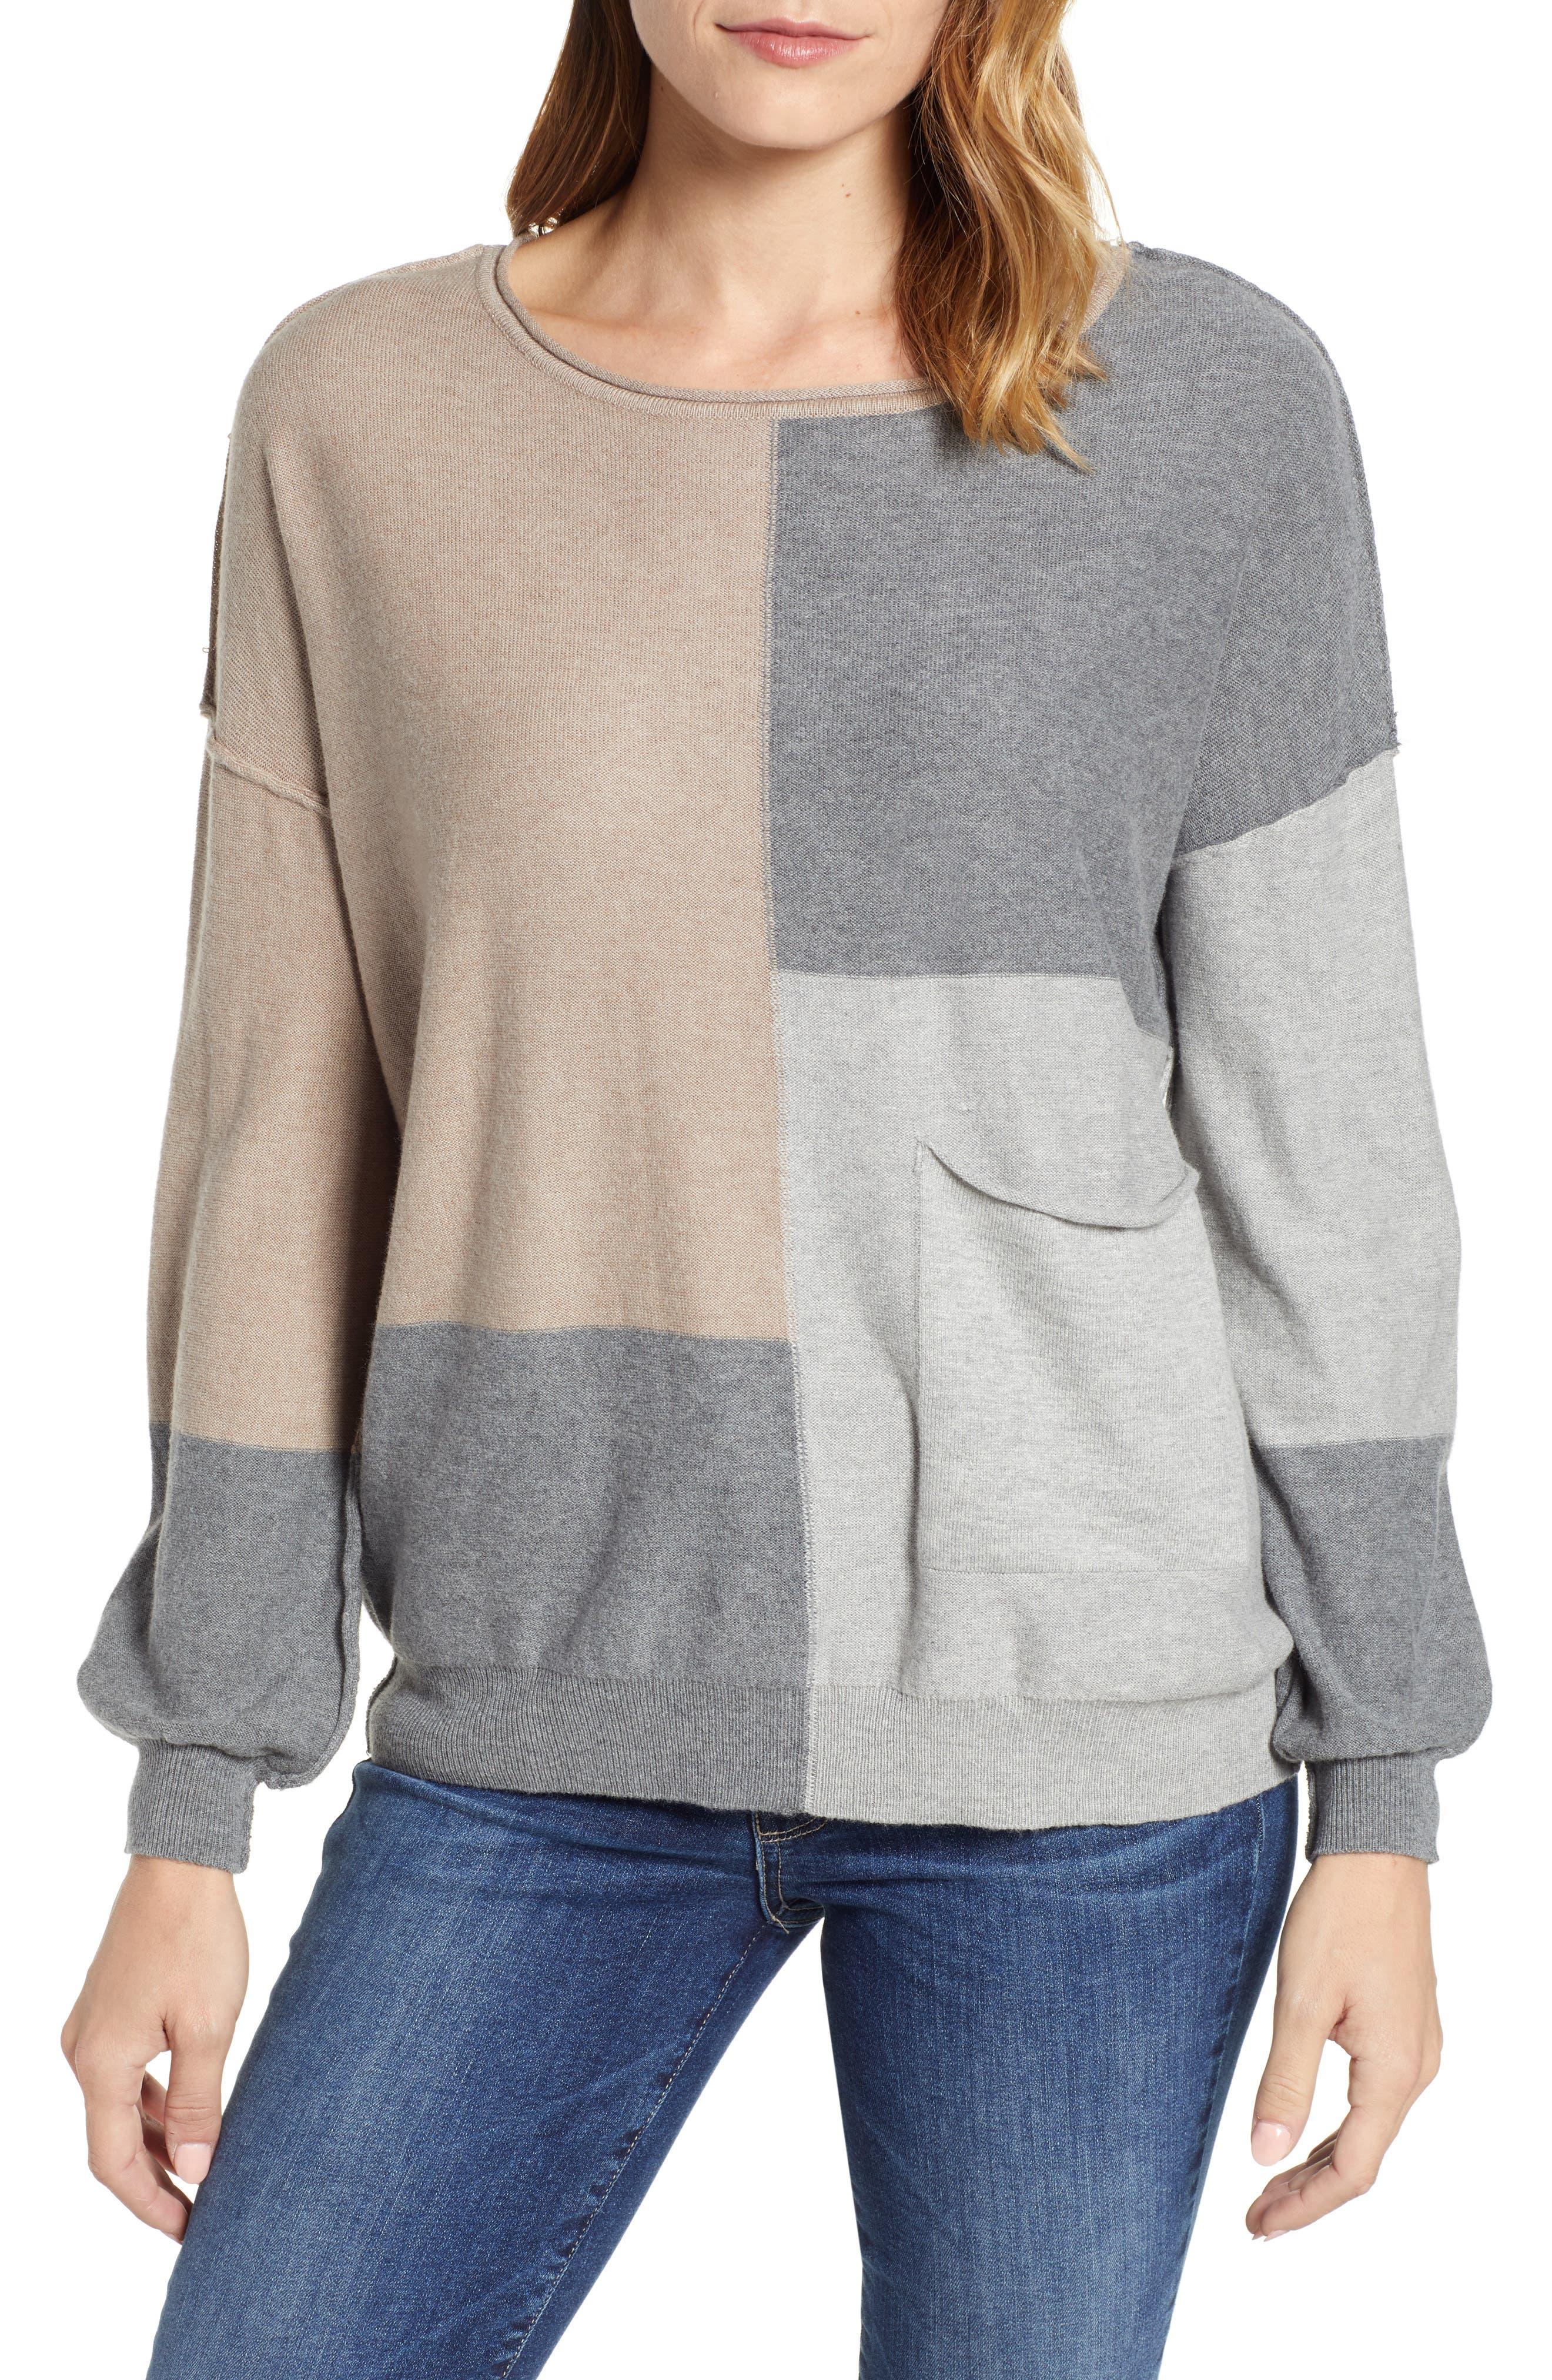 Colorblock Sweater,                         Main,                         color, TAUPE/ HEATHER GREY